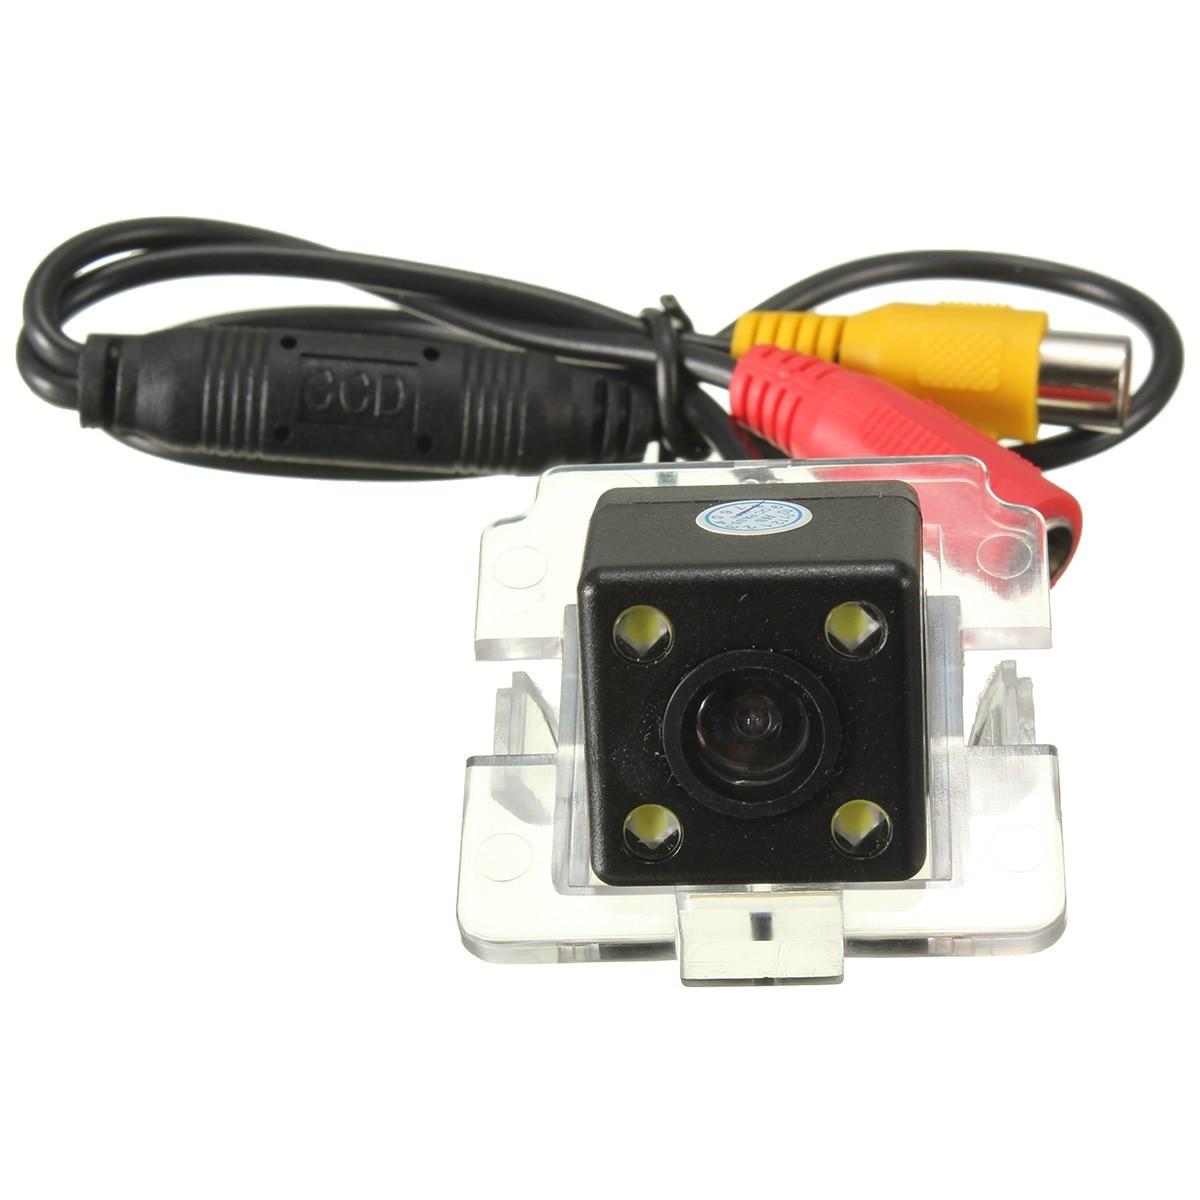 HD 4LED CCD Night Vision Parking Car Backup Rear View Rearview Camera For Mitsubishi Outlander ...